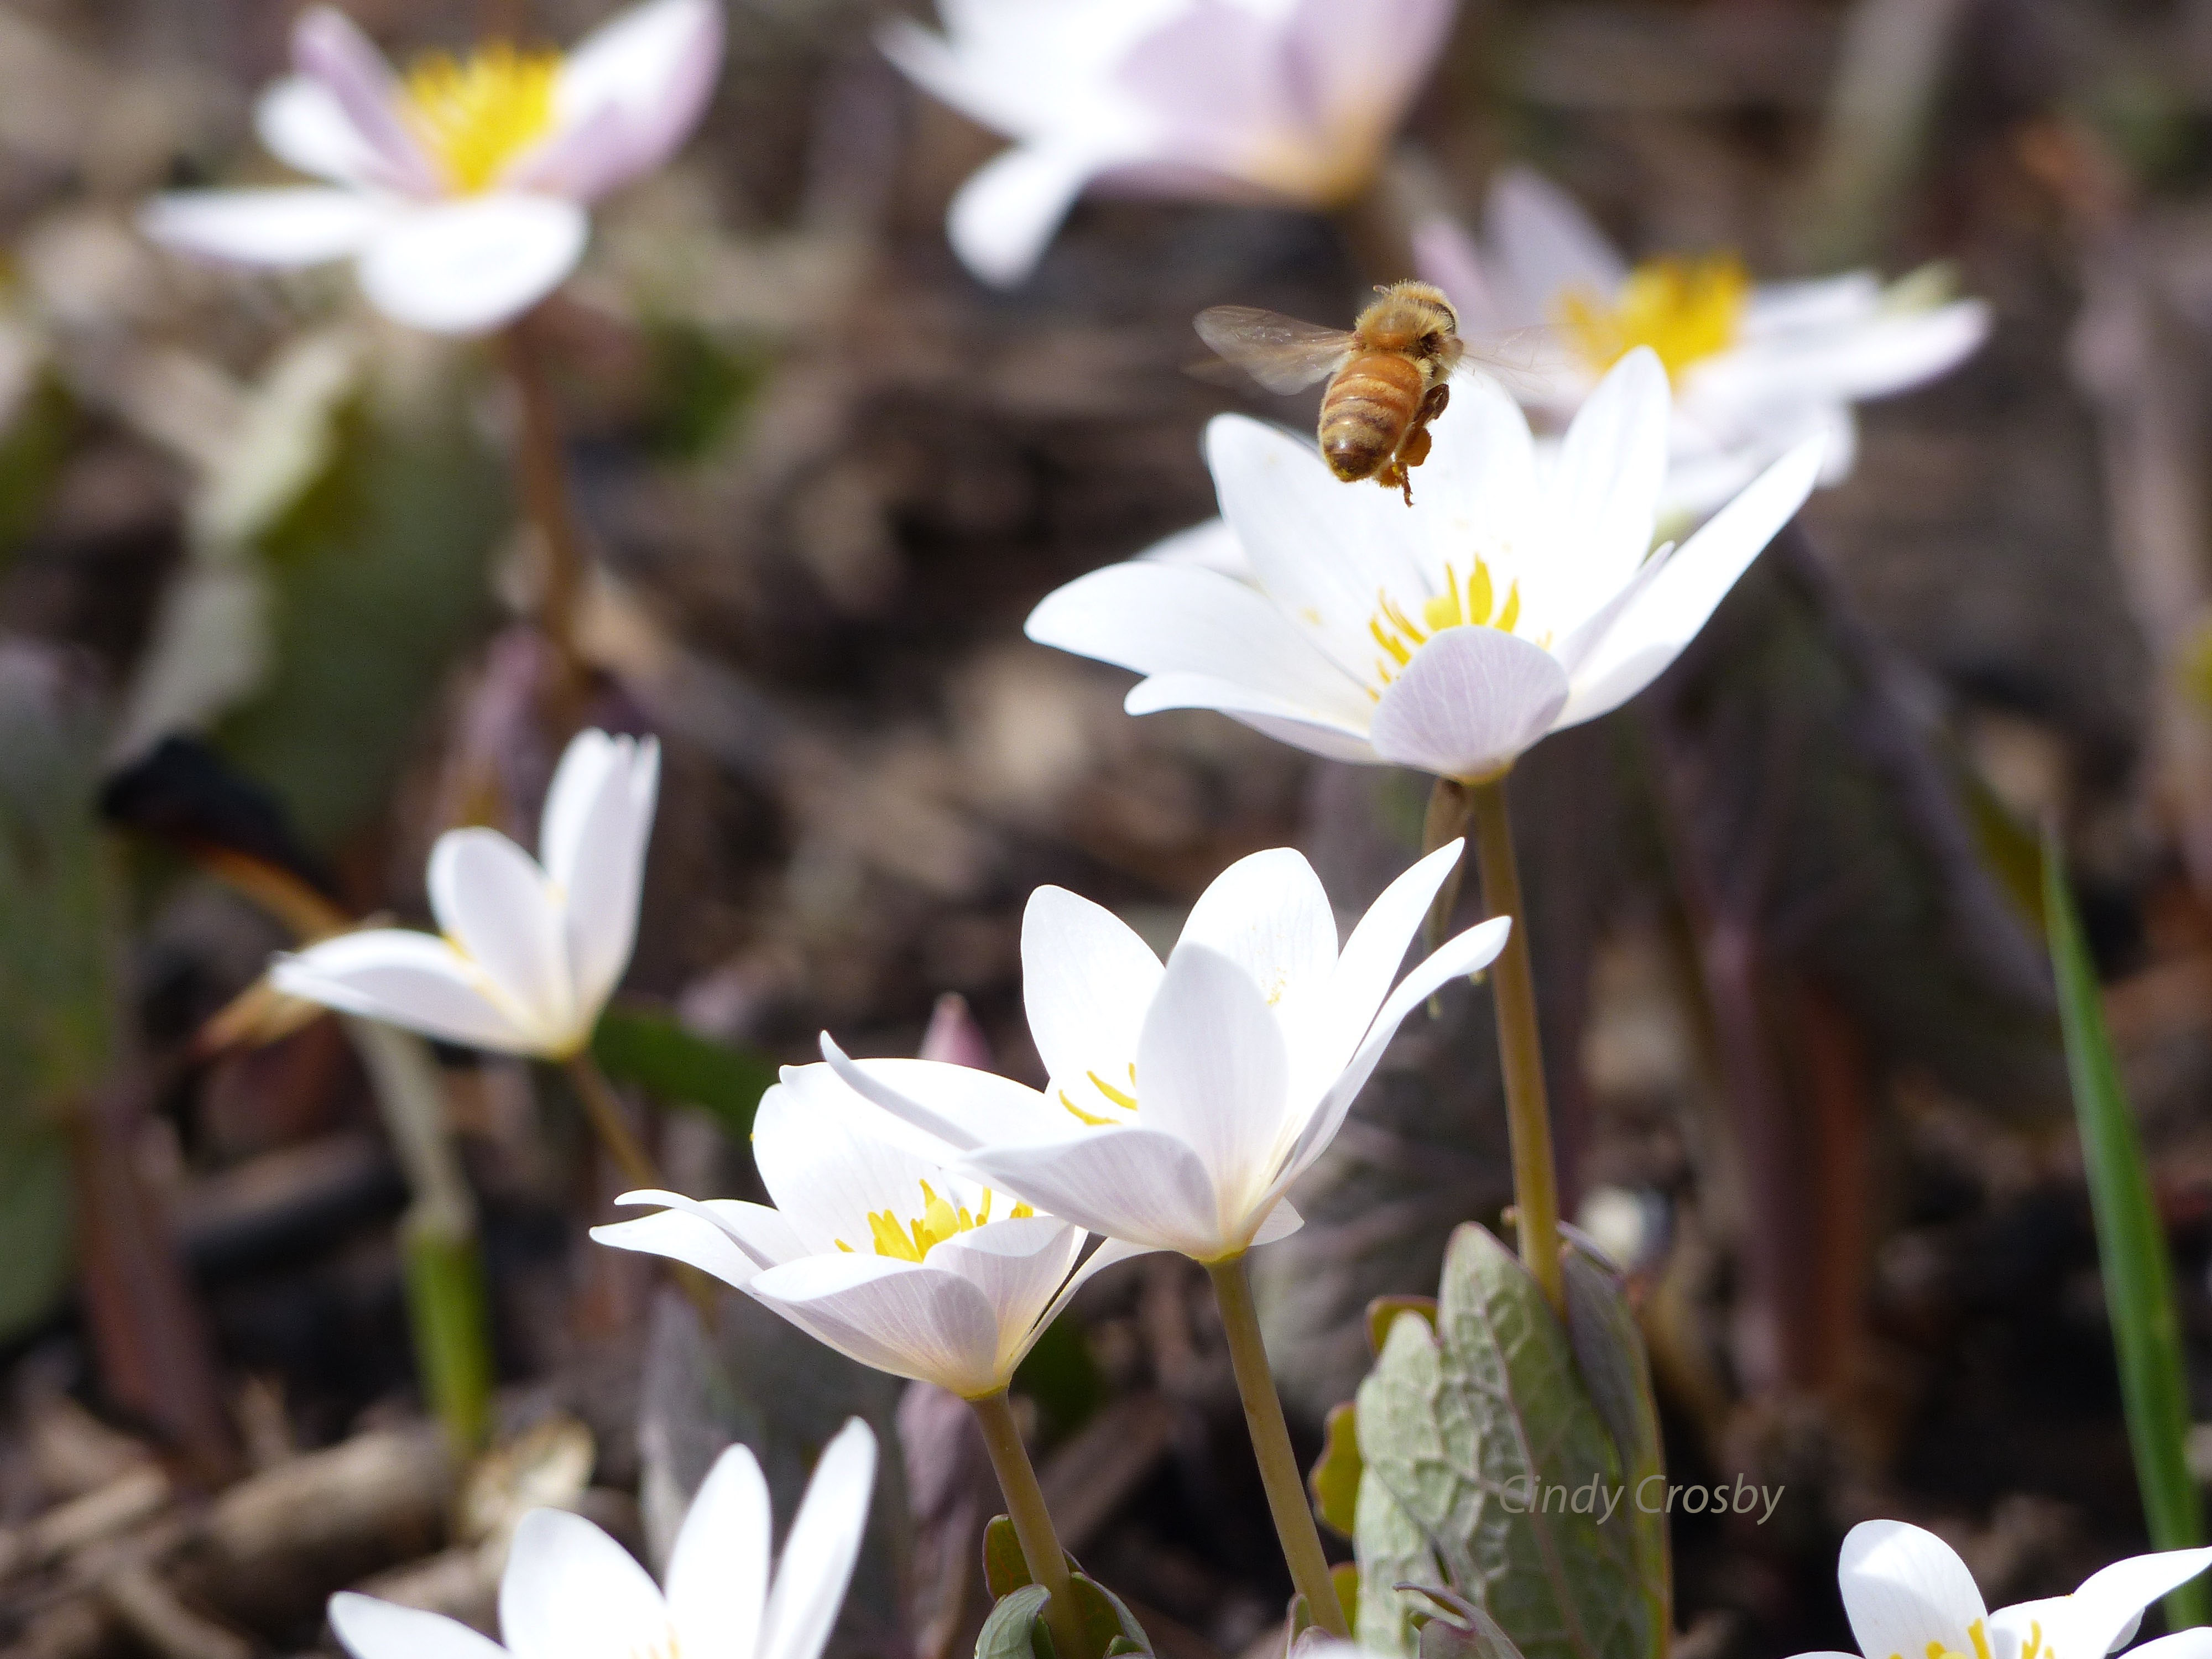 honeybeebloodrootSPMA42618wm.jpg